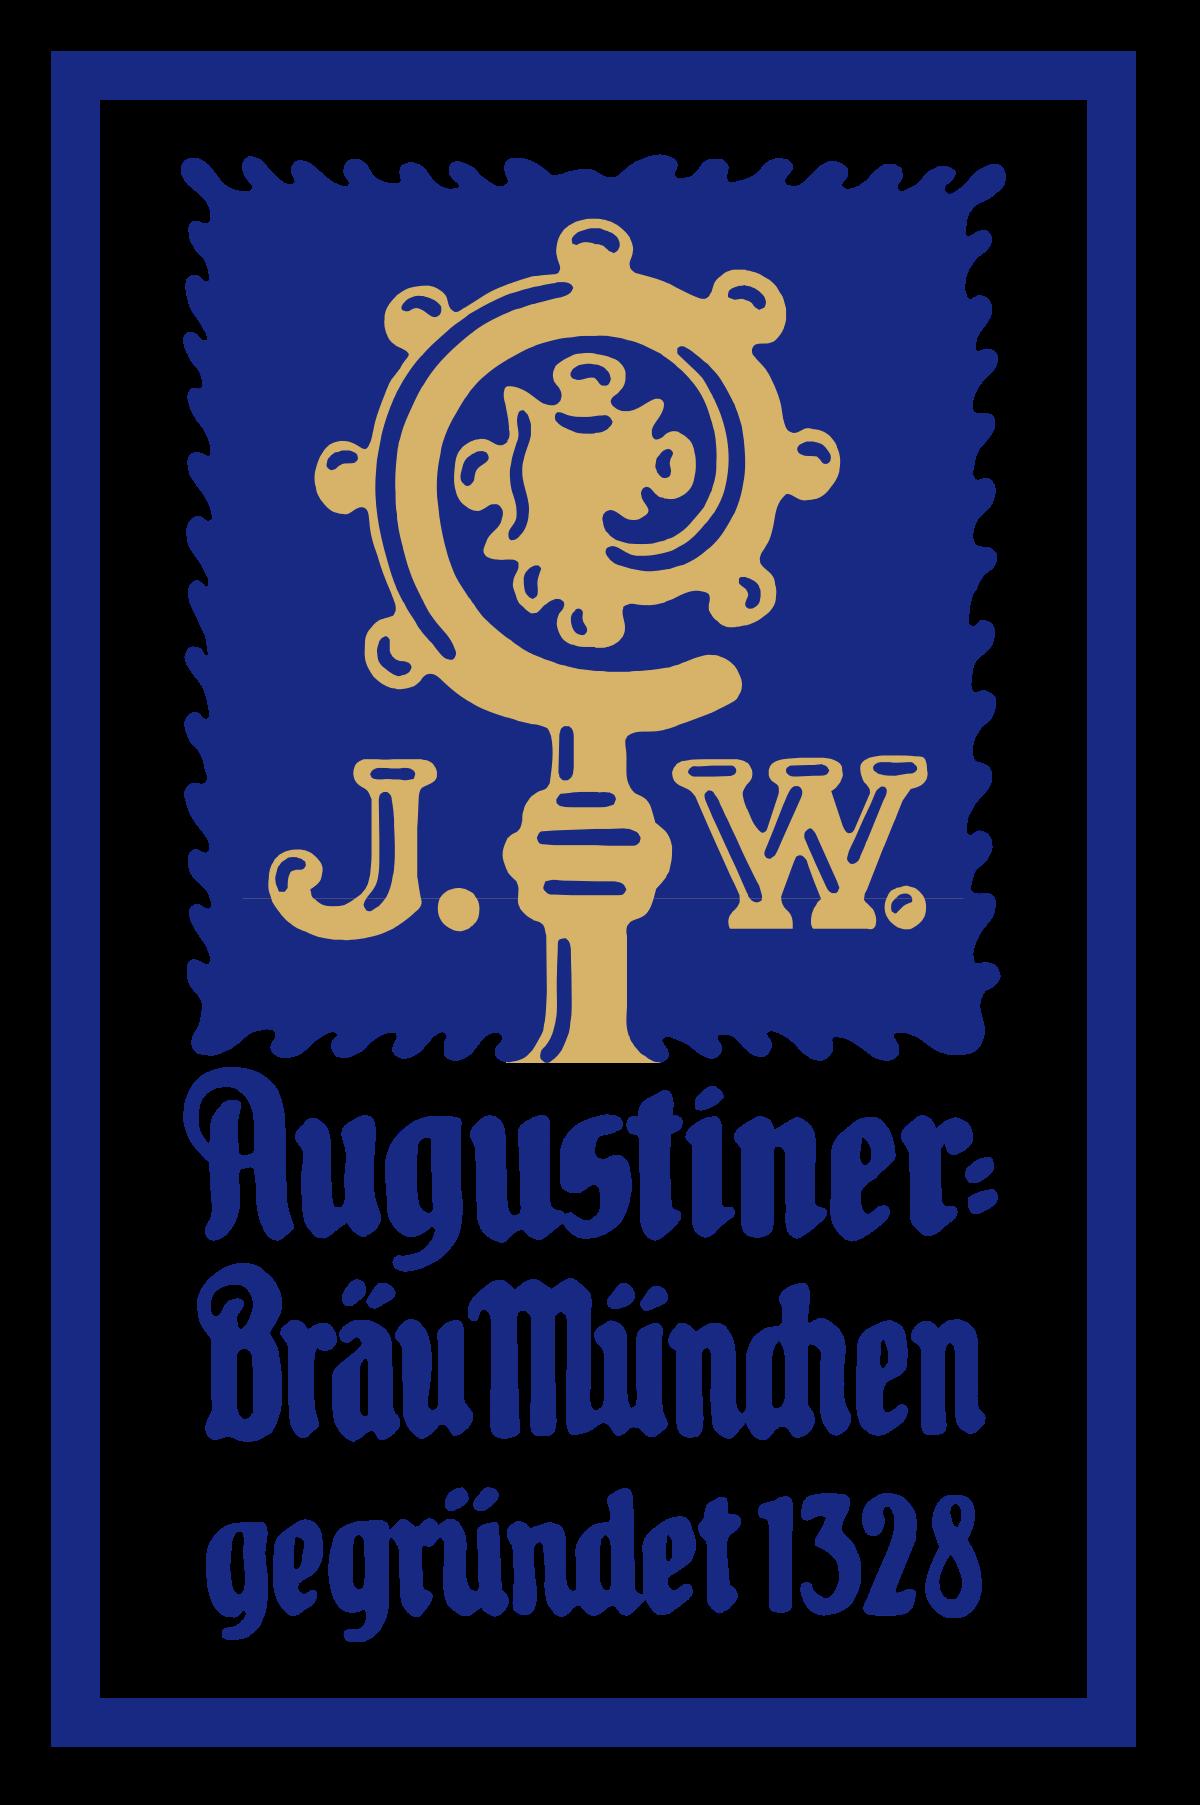 Augustiner